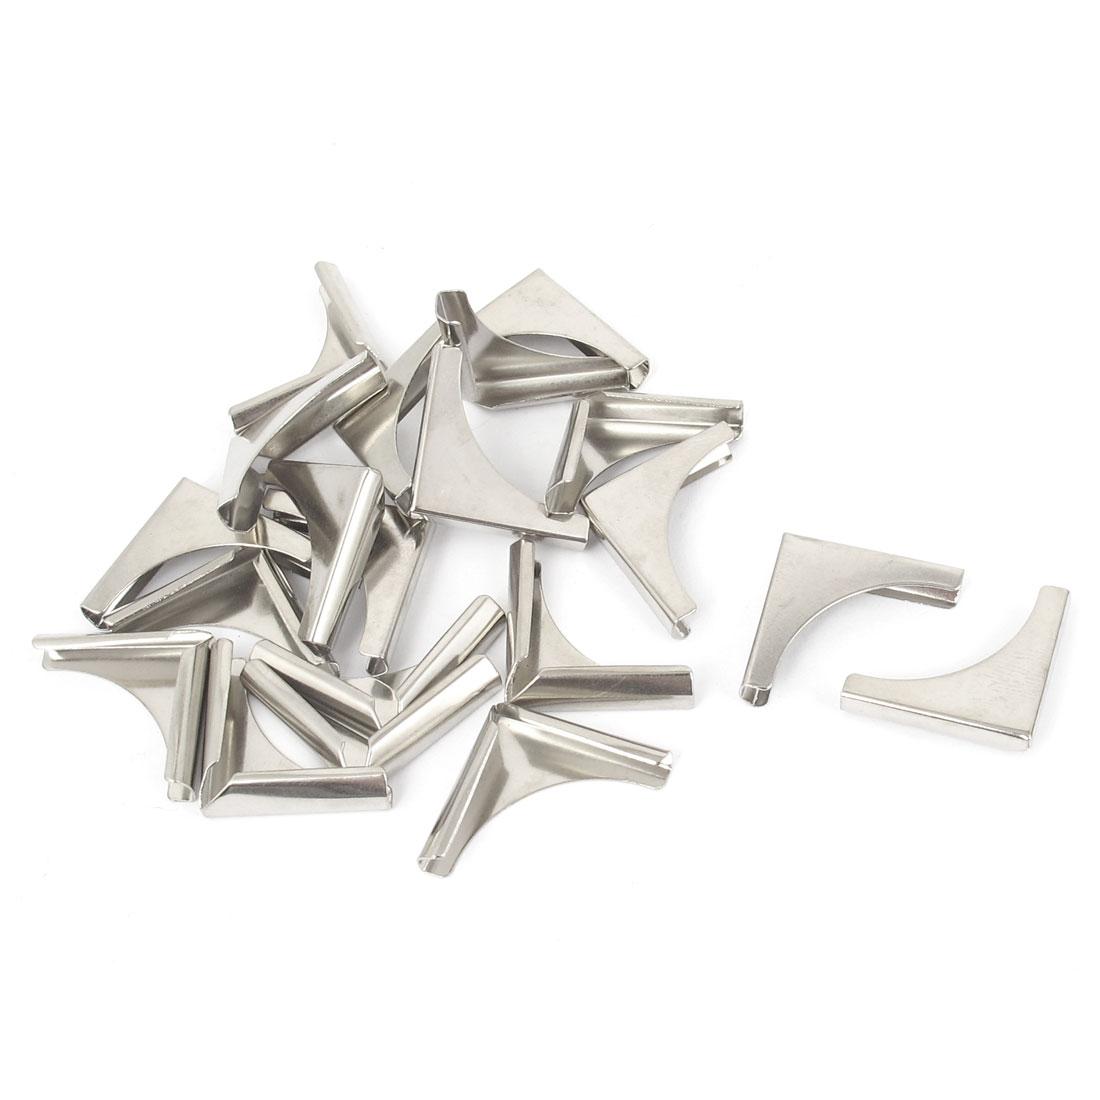 Book Photo Album Scrapbooks Metal Angle Corner Bracket Protector Silver Tone 20pcs